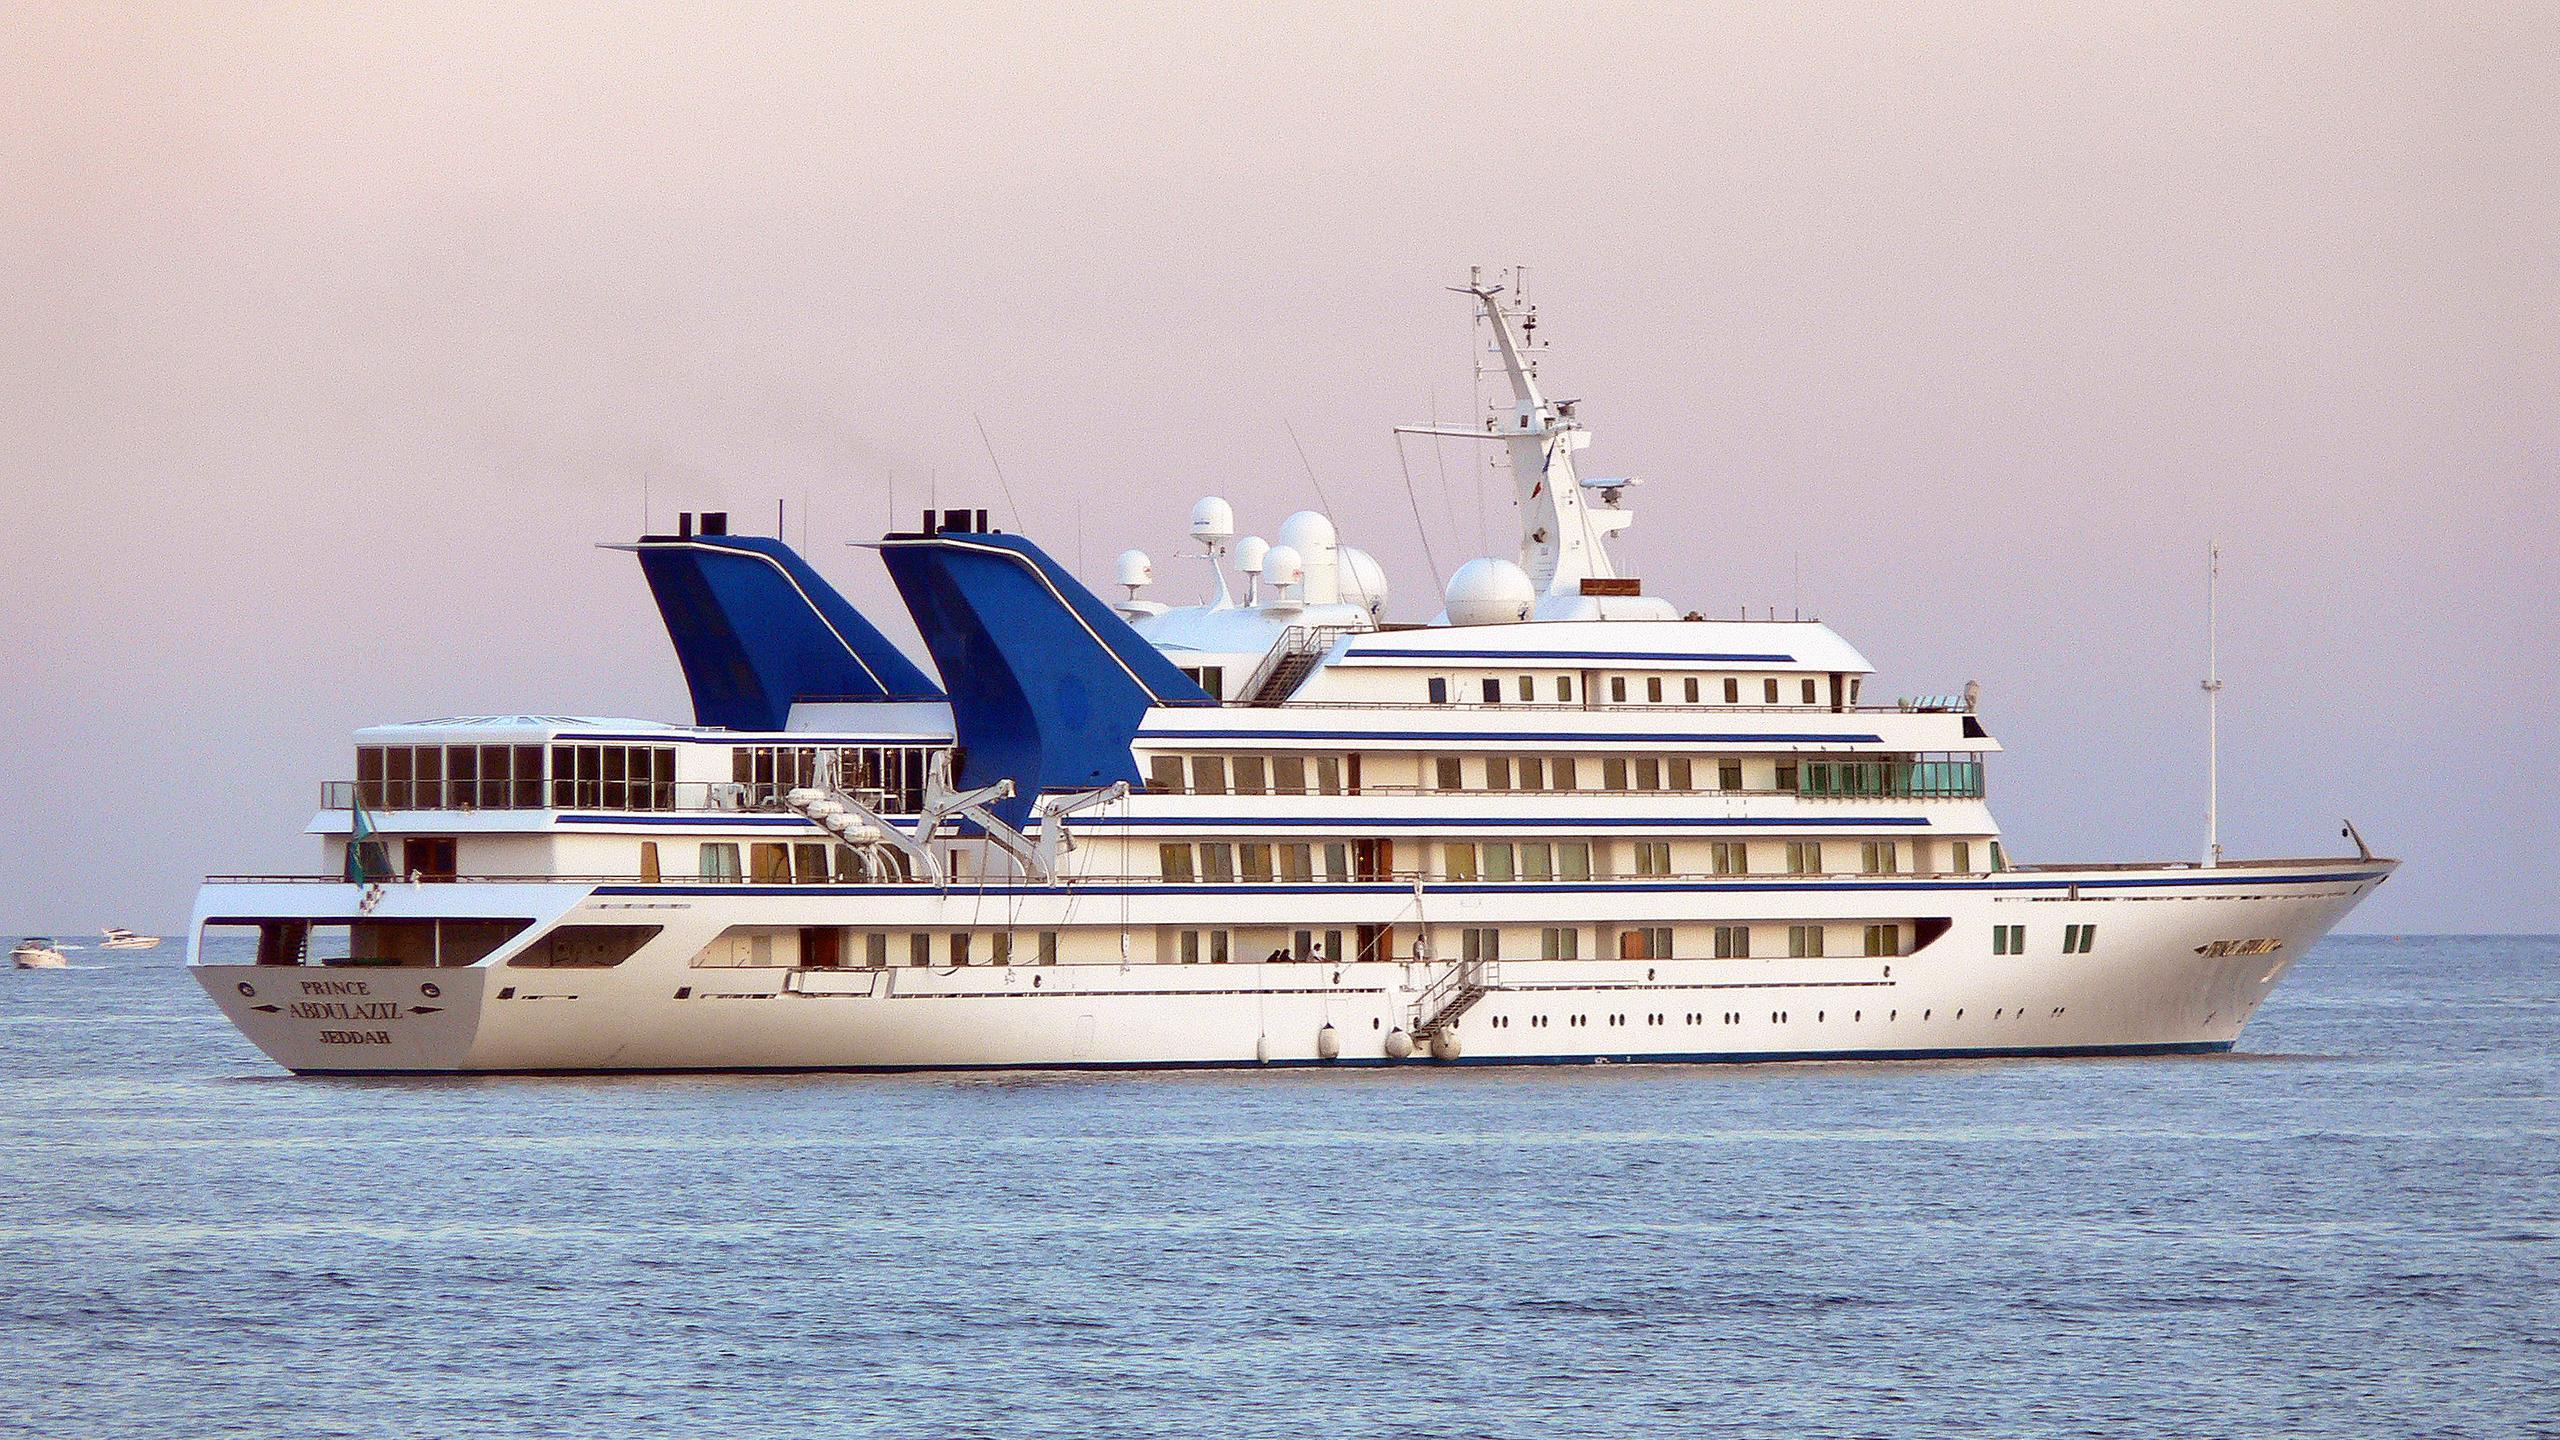 princeabdulaziz-motor-yacht-helsingor-vaerft-1984-147m-stern